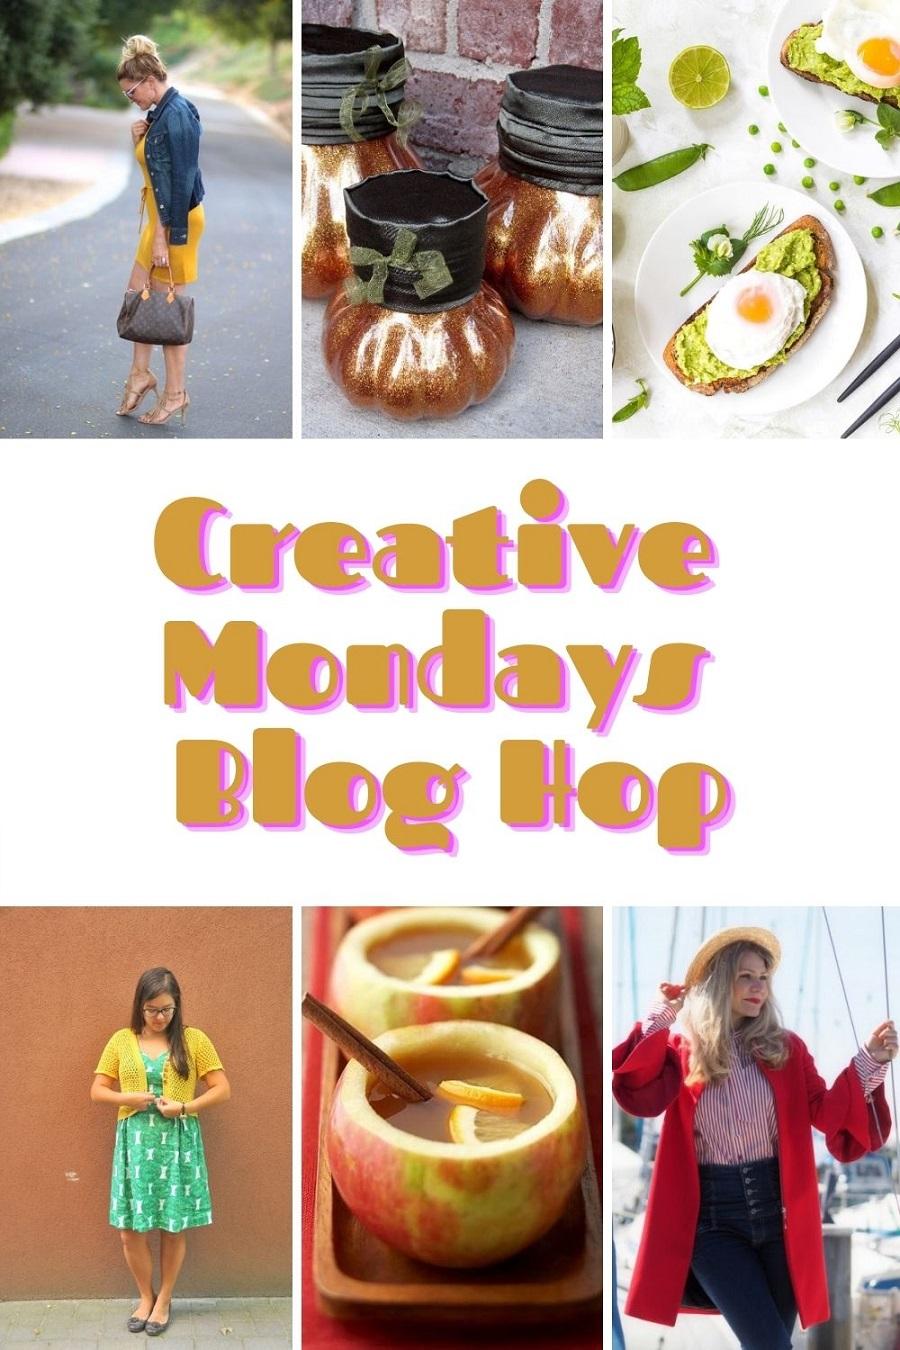 Creative Mondays Blog Hop